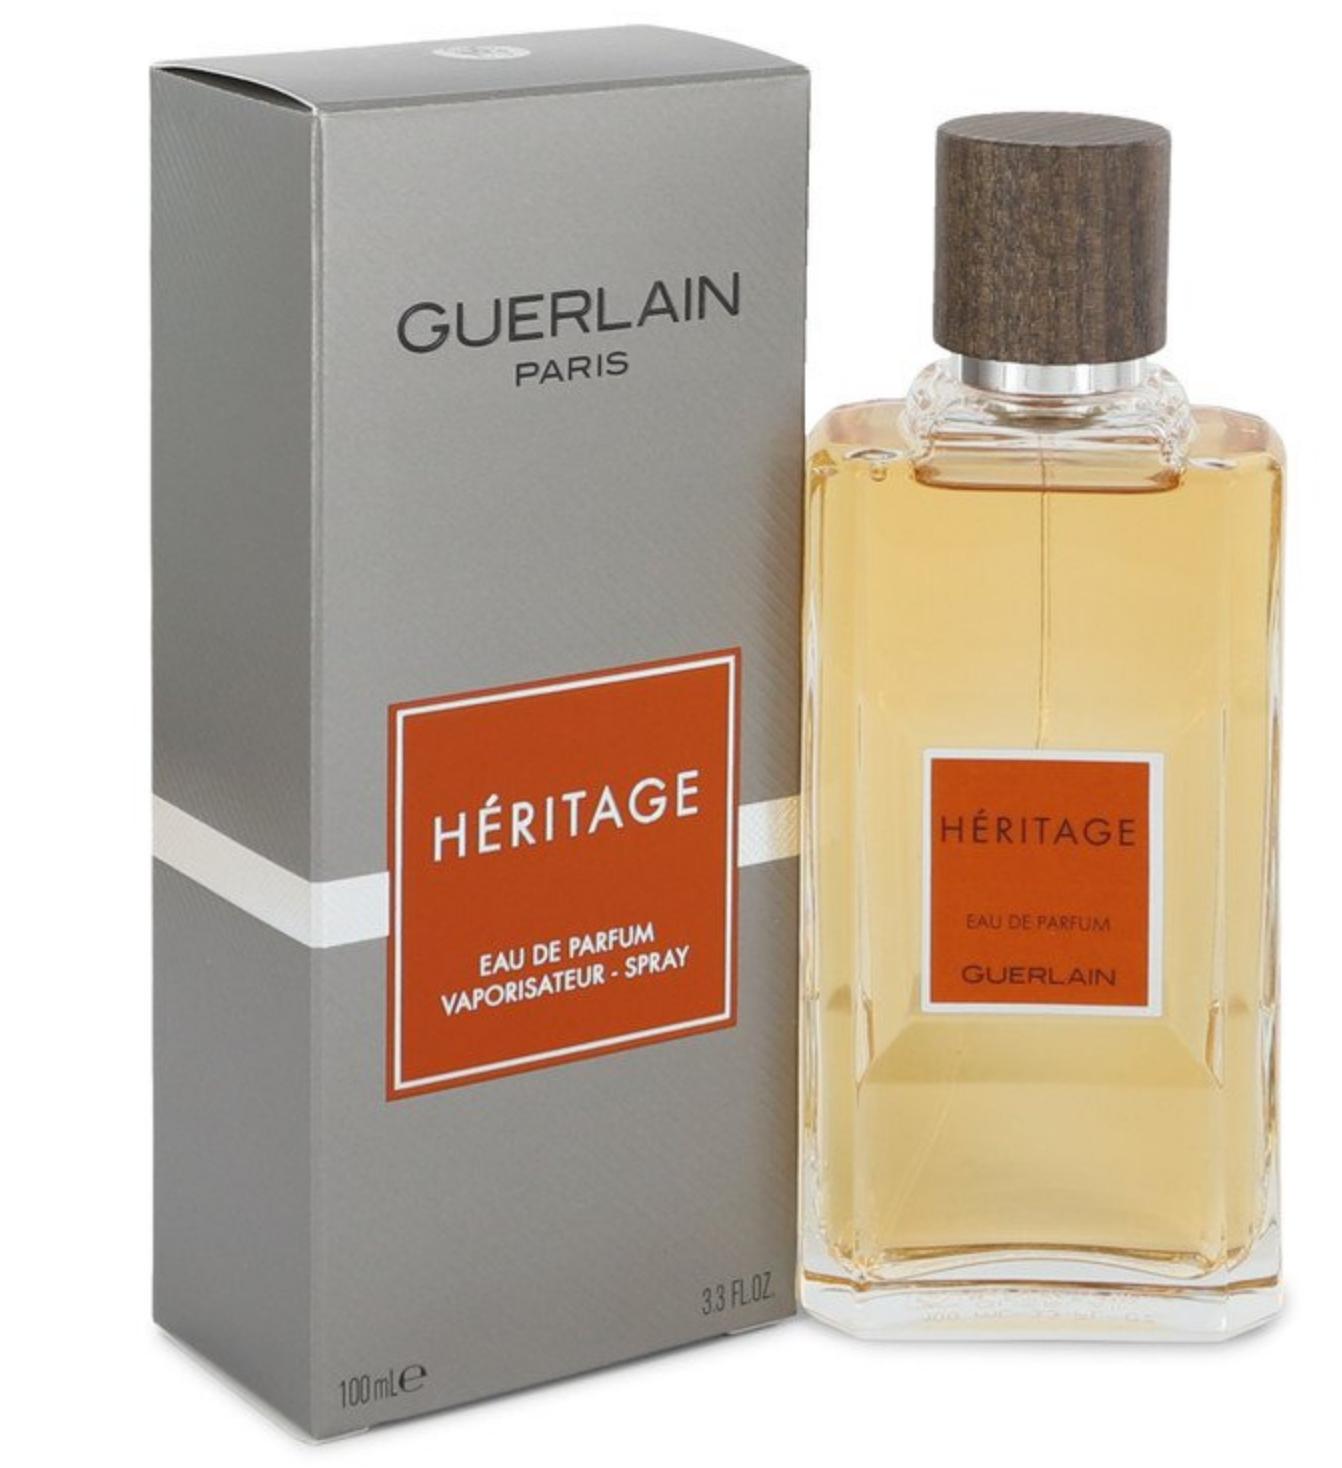 Edp Mens Guerlain Cologne De Parfum 100ml Eau Spray Heritage Ebe2IYWDH9